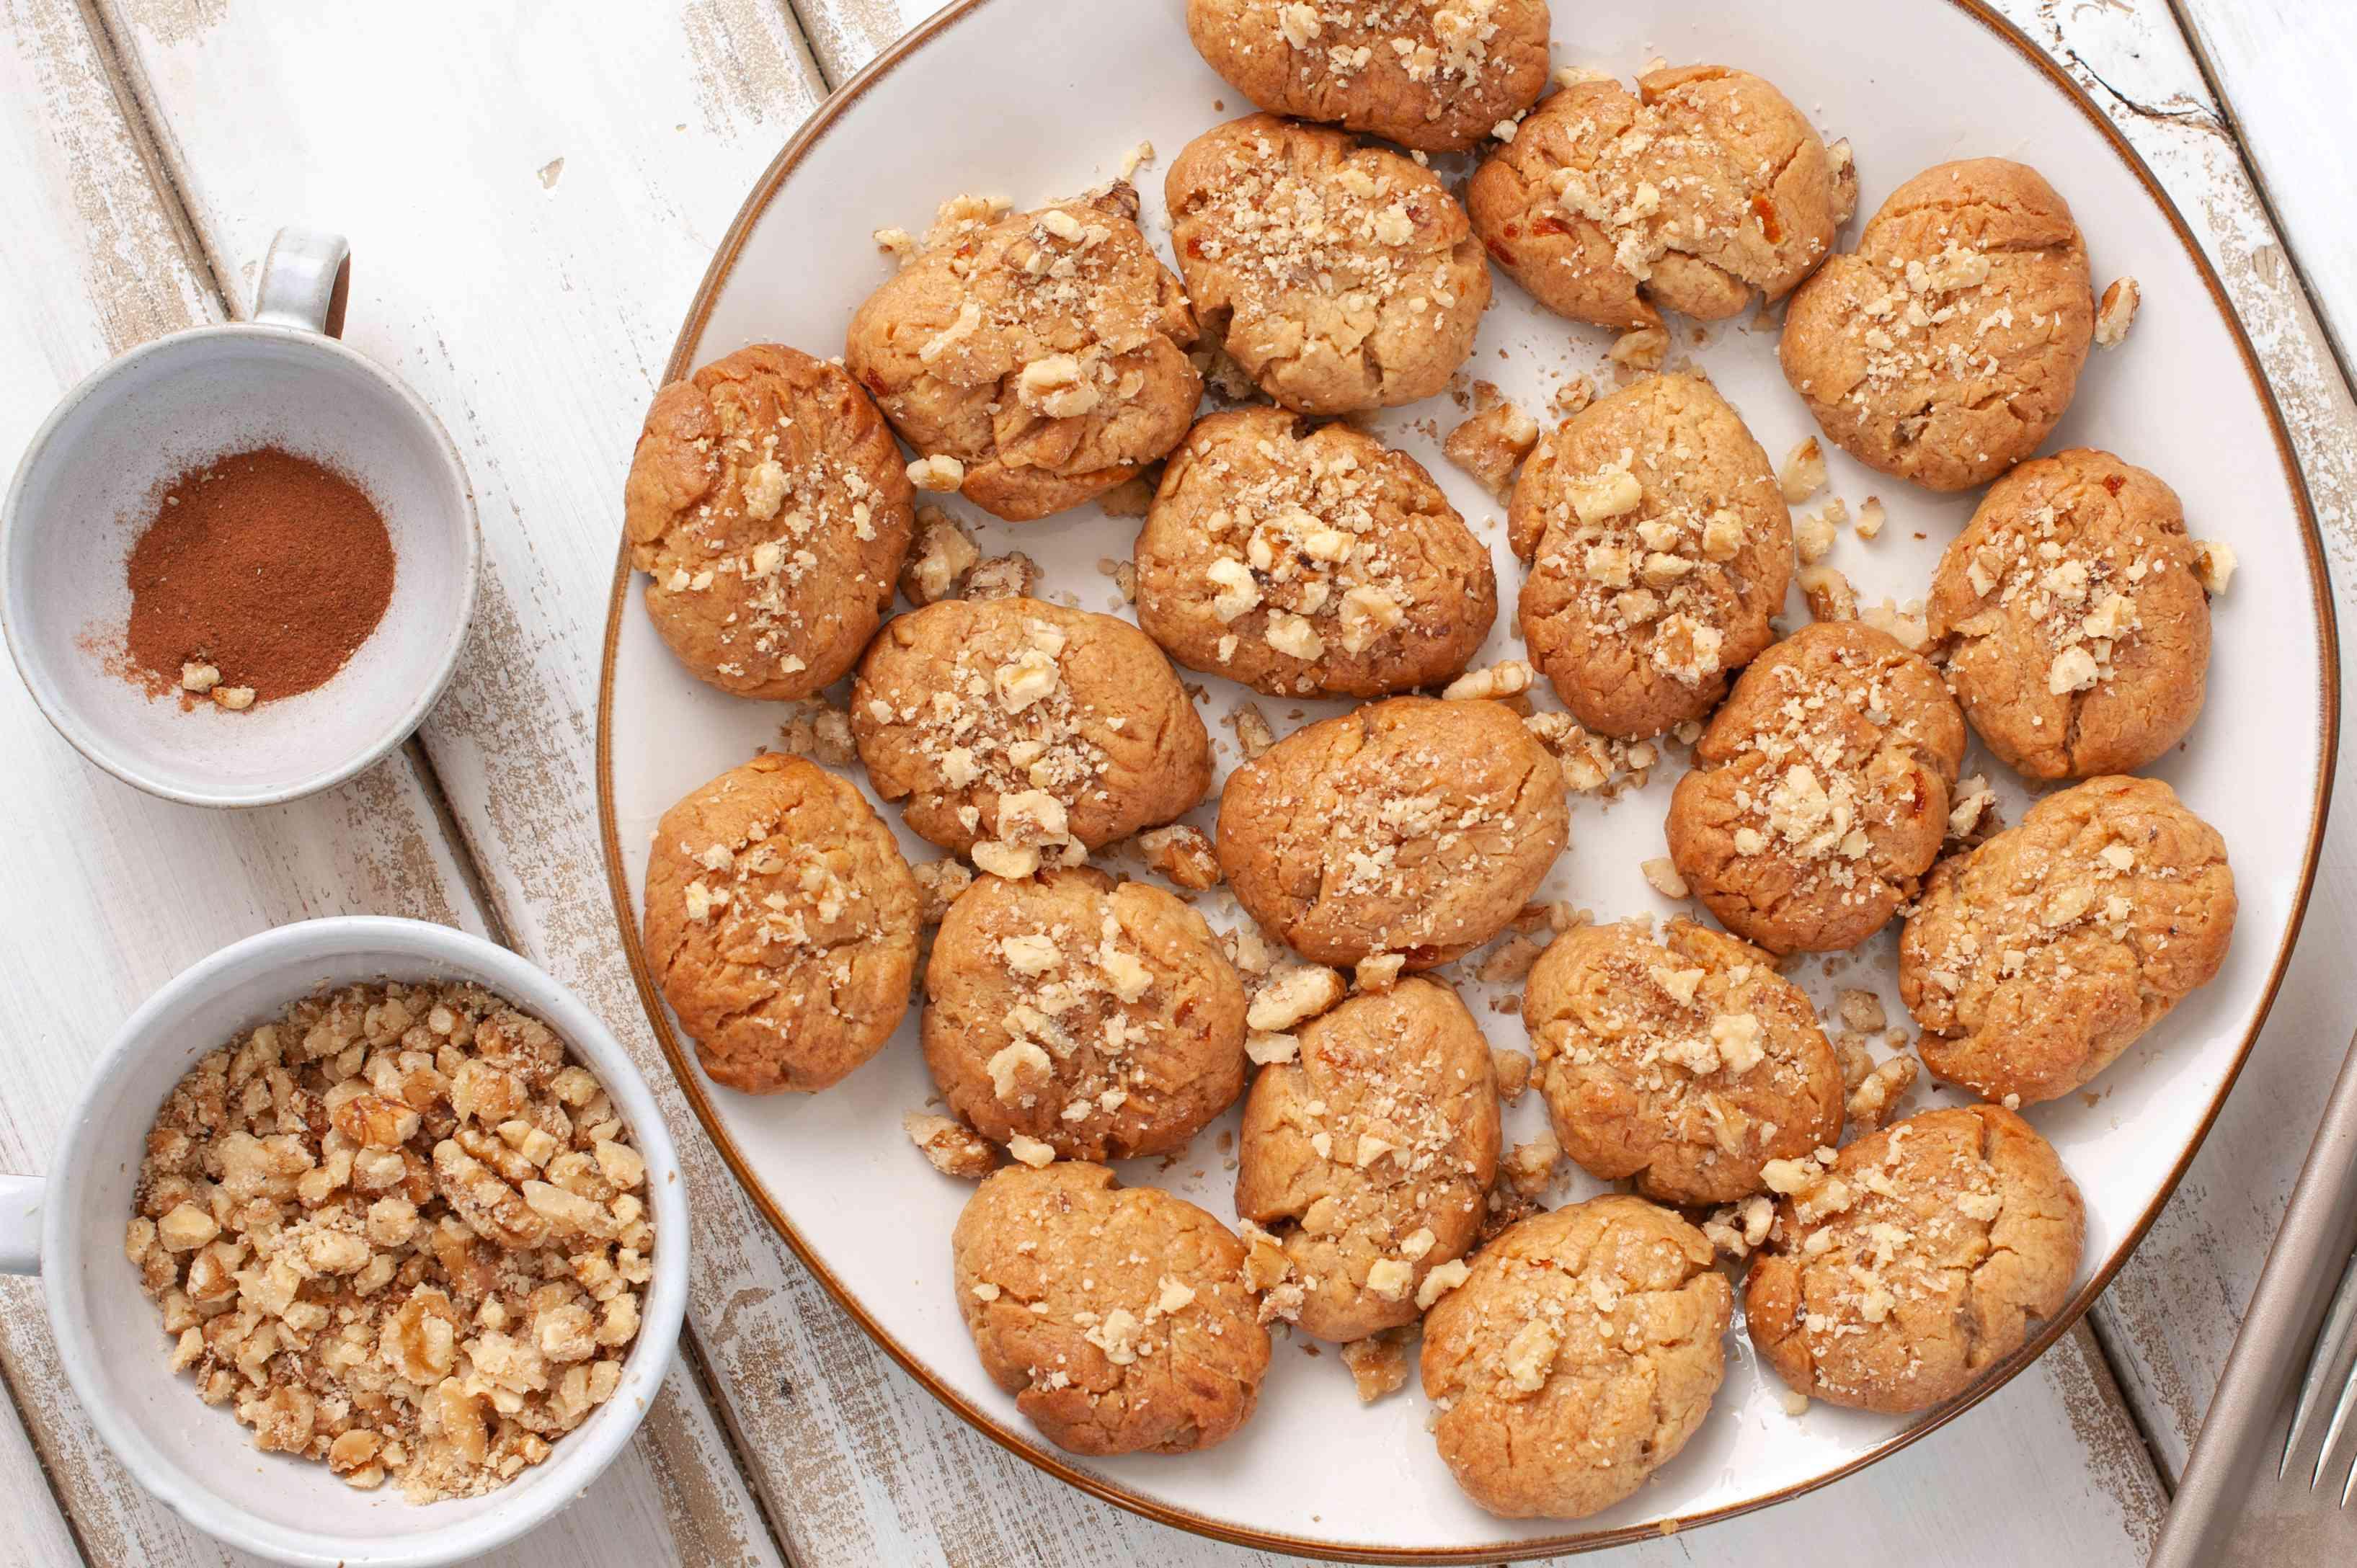 Melomakarona Greek honey cookies with walnuts recipe